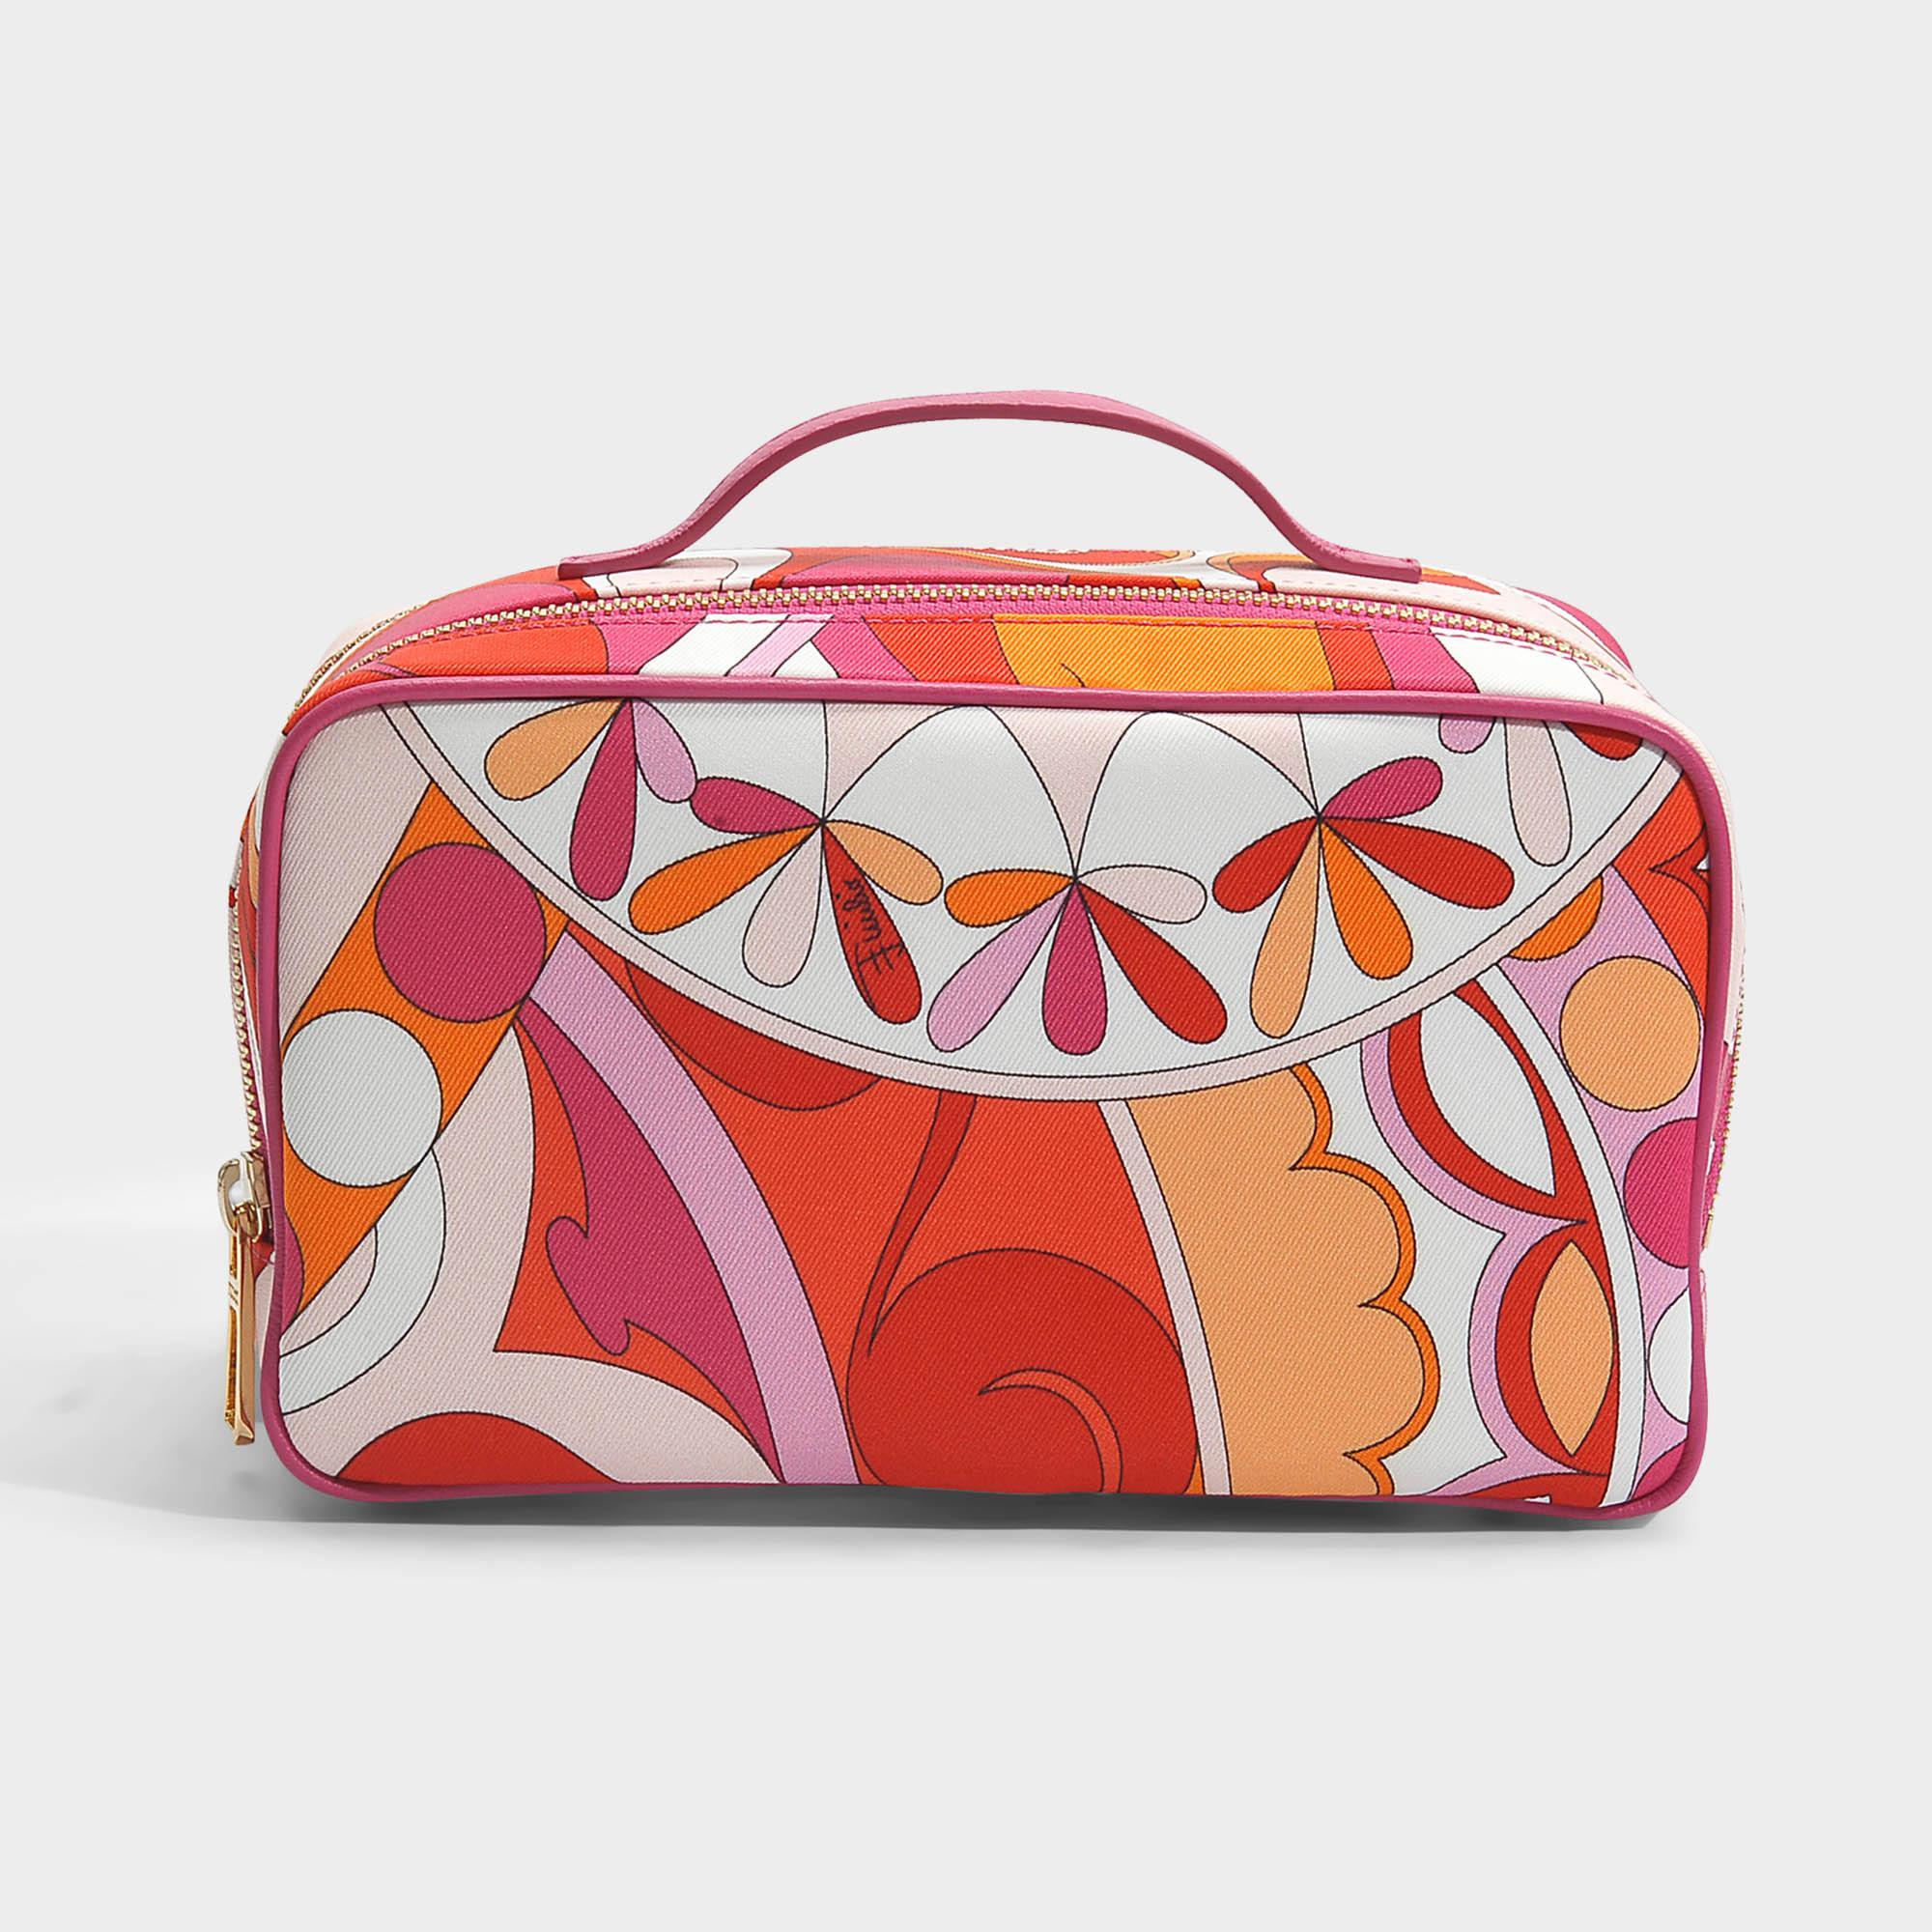 Capri Big Case Bag in Orange Printed Nylon Emilio Pucci vExju